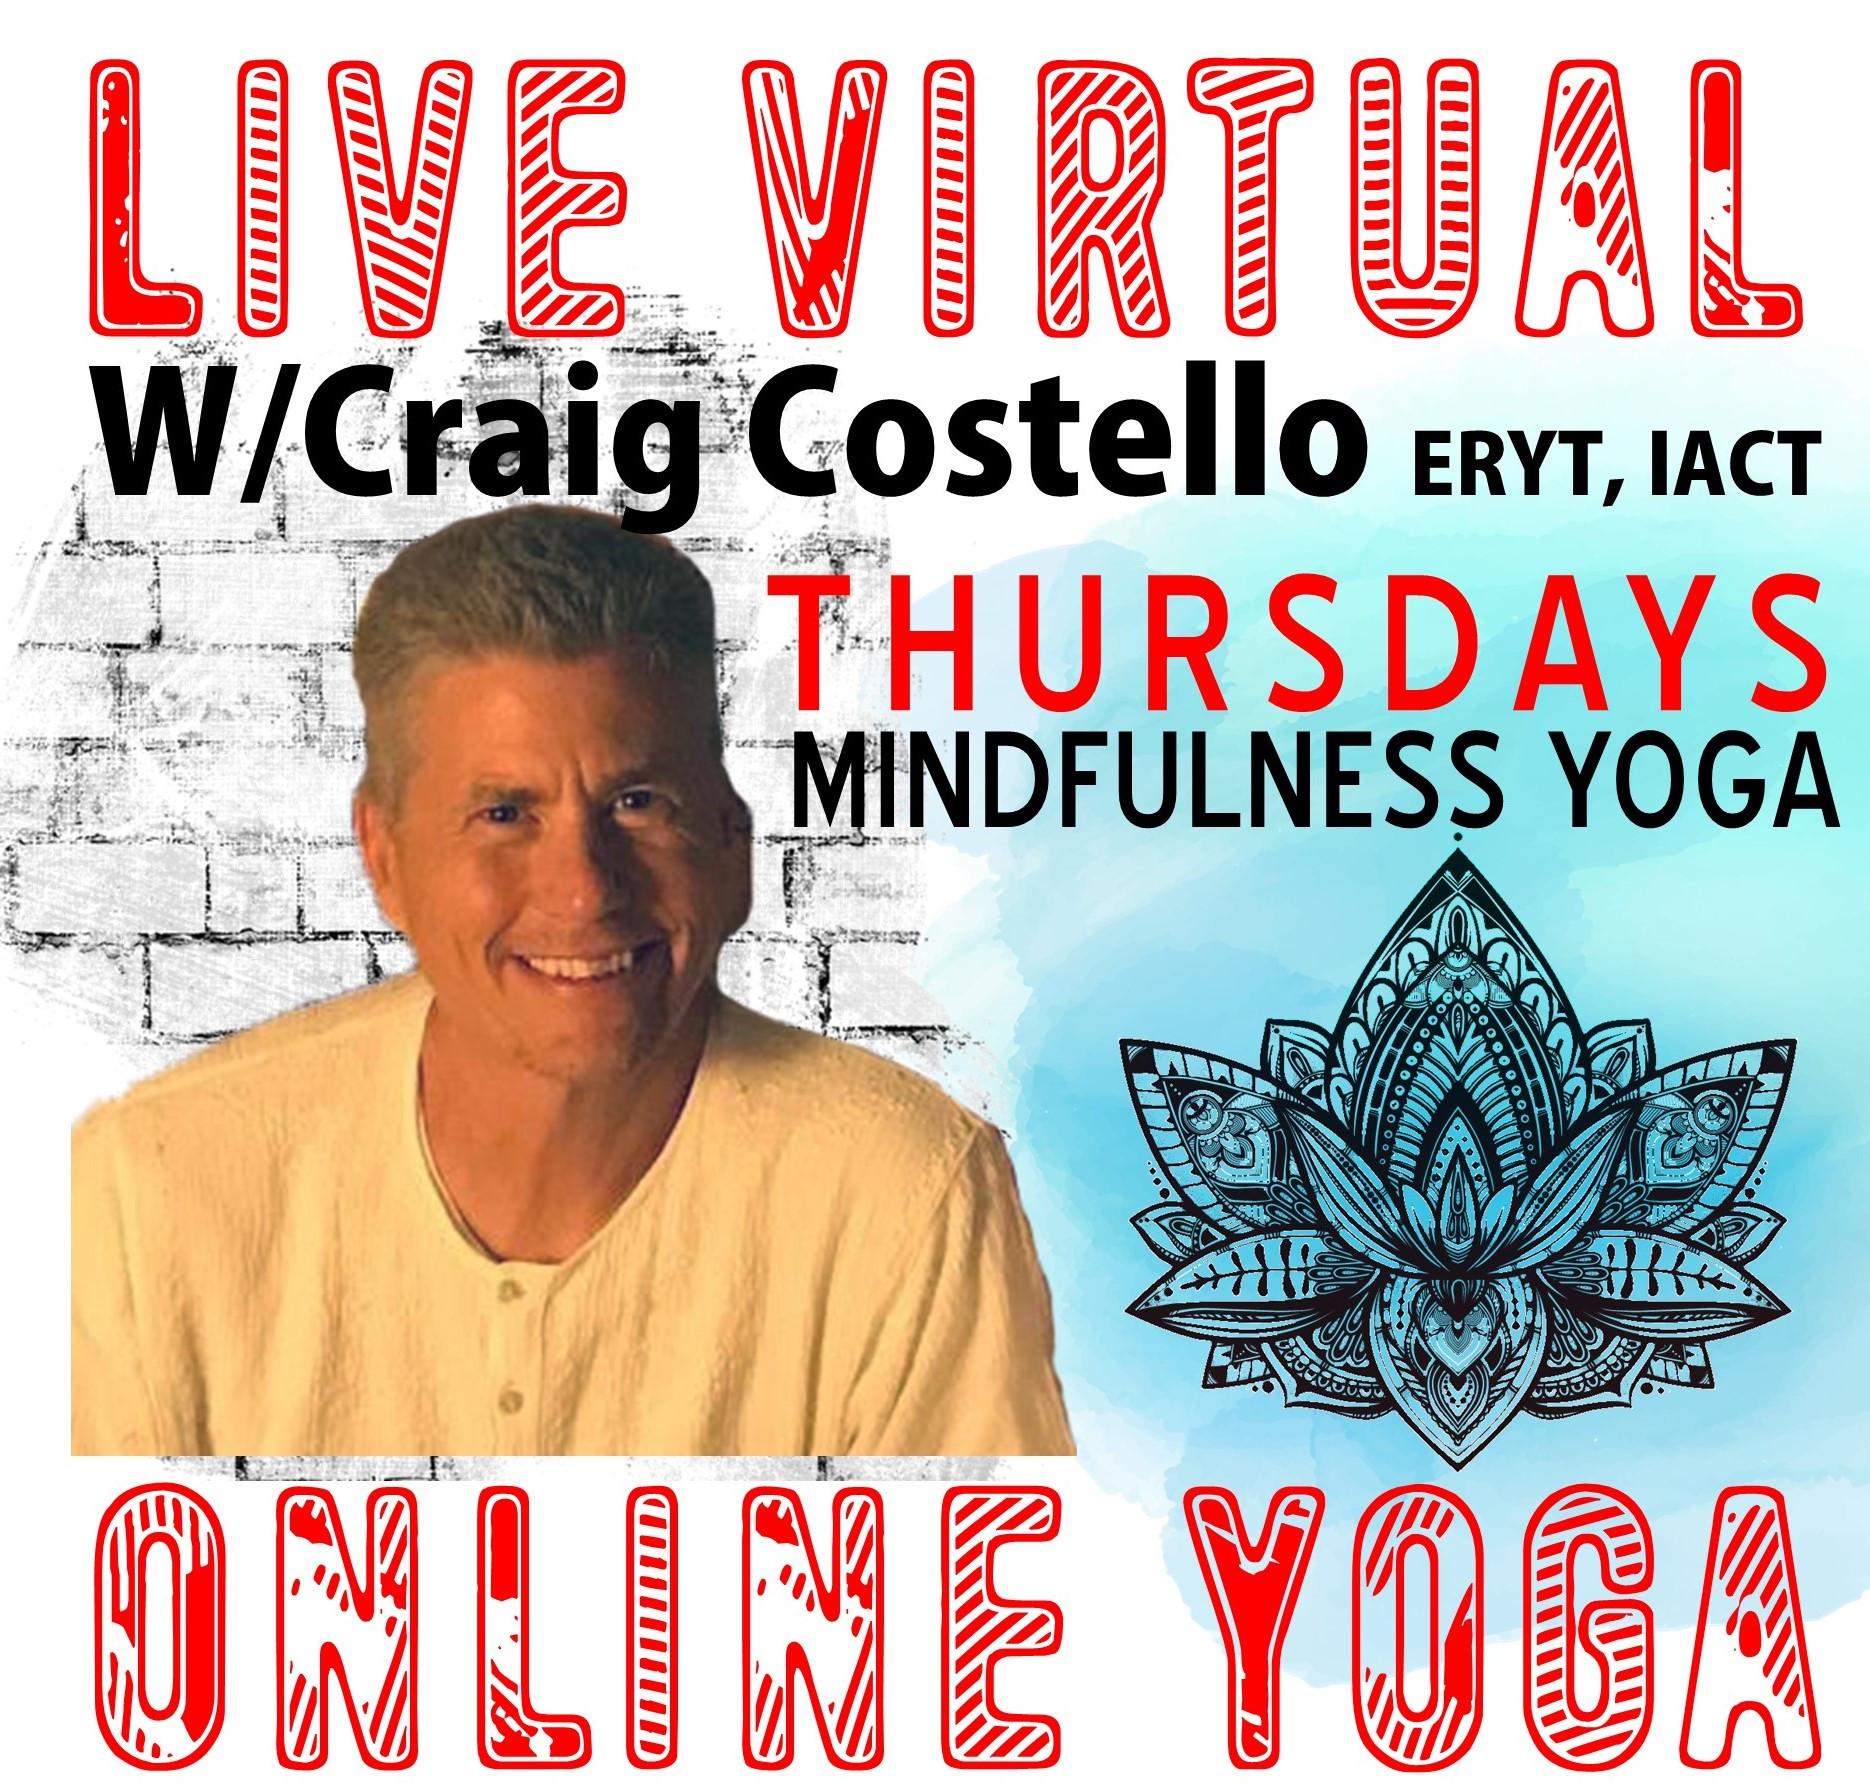 Mindfulness Yoga W/Craig Costello